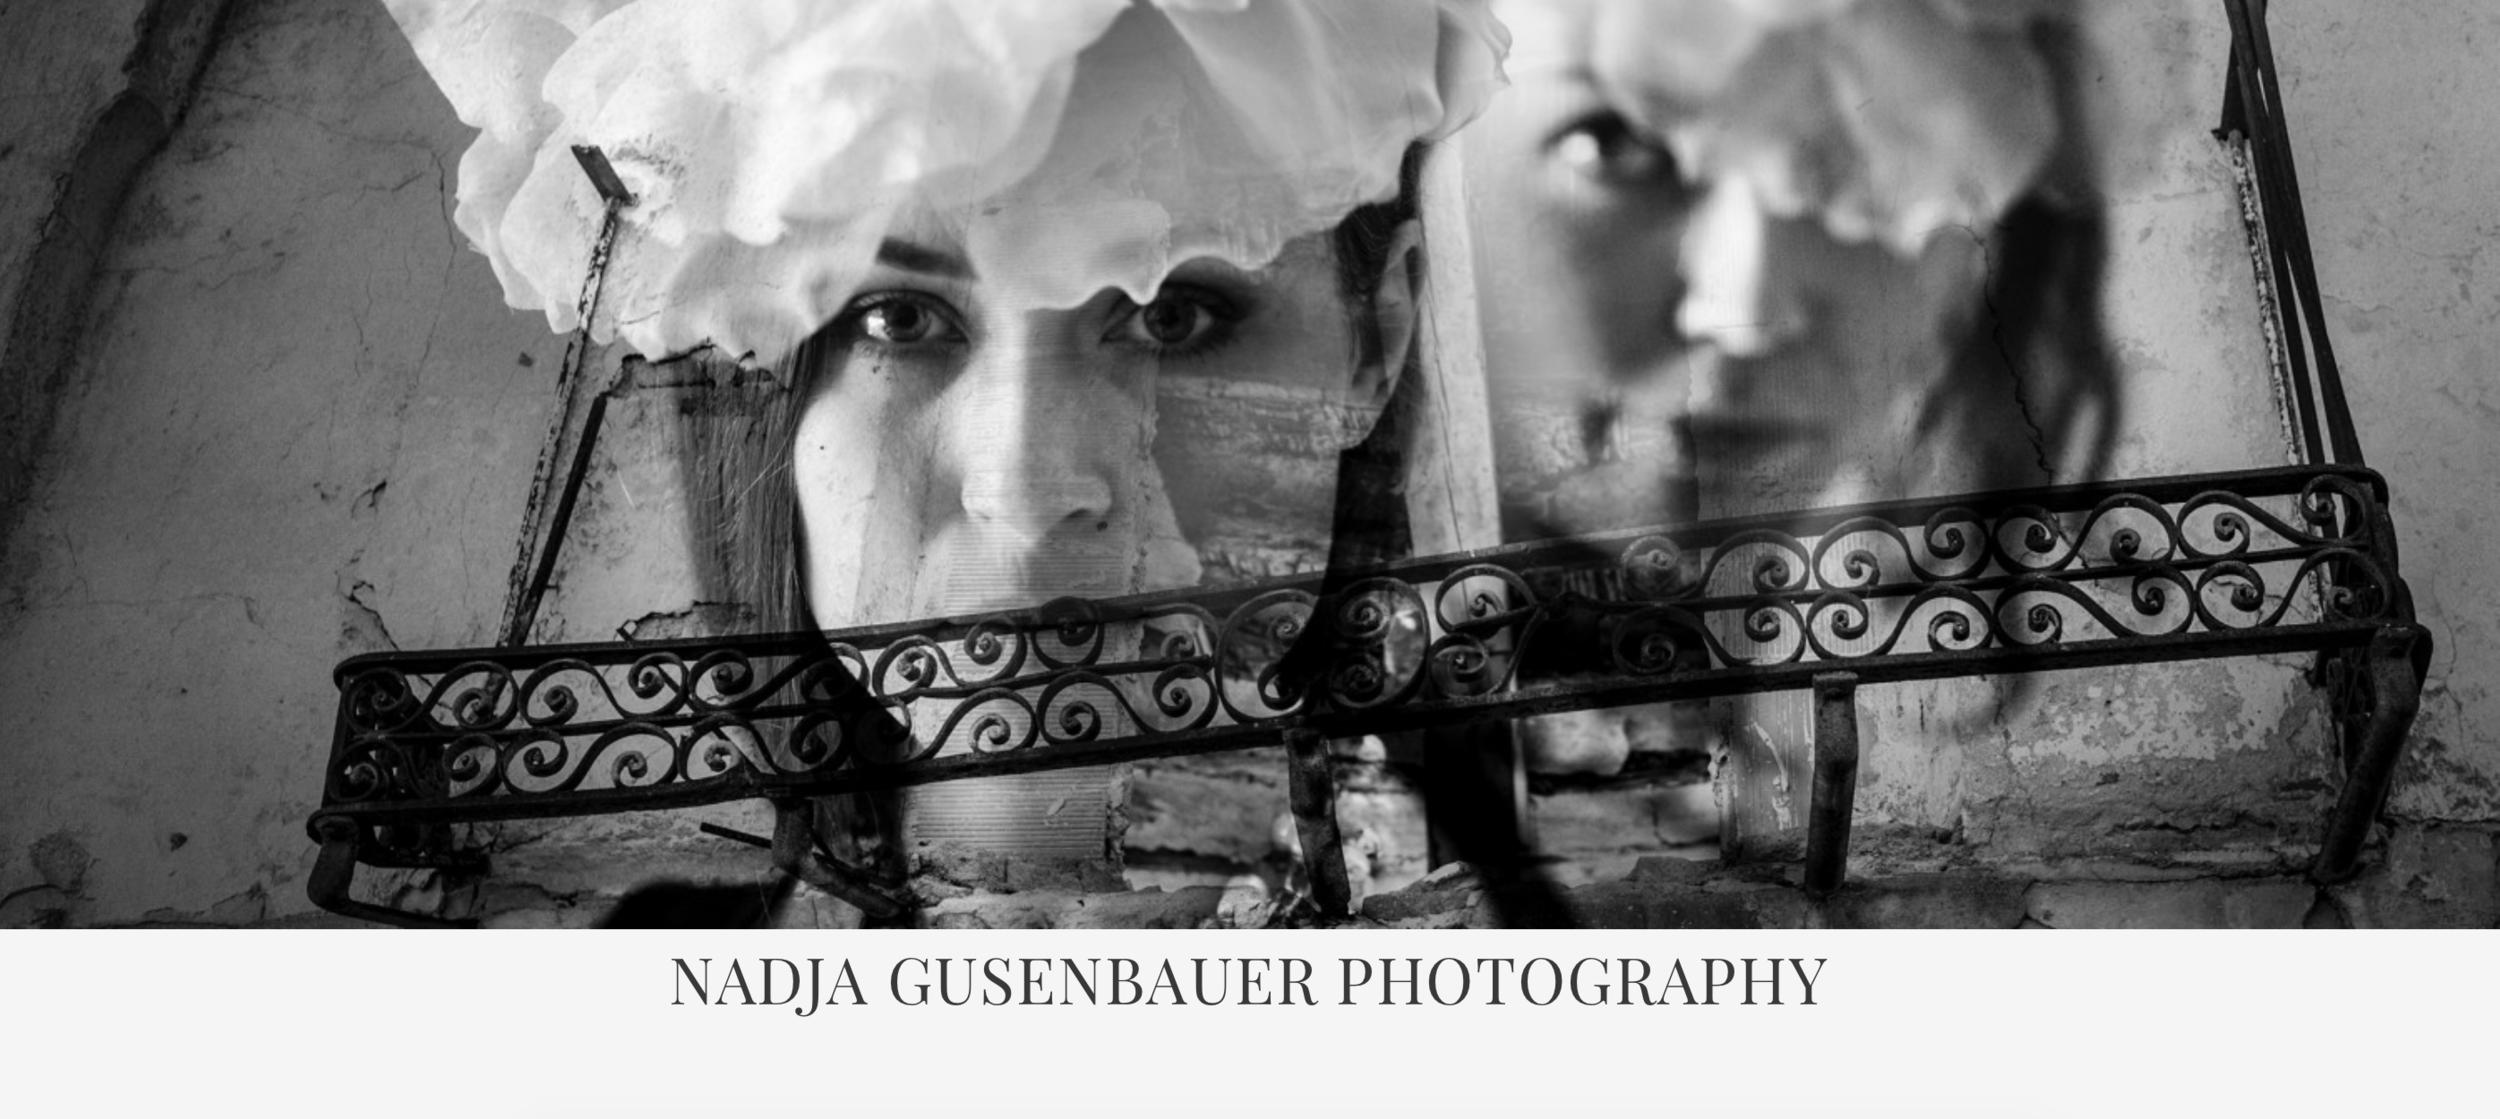 n-photography - by Ing.Nadja Gusenbauer